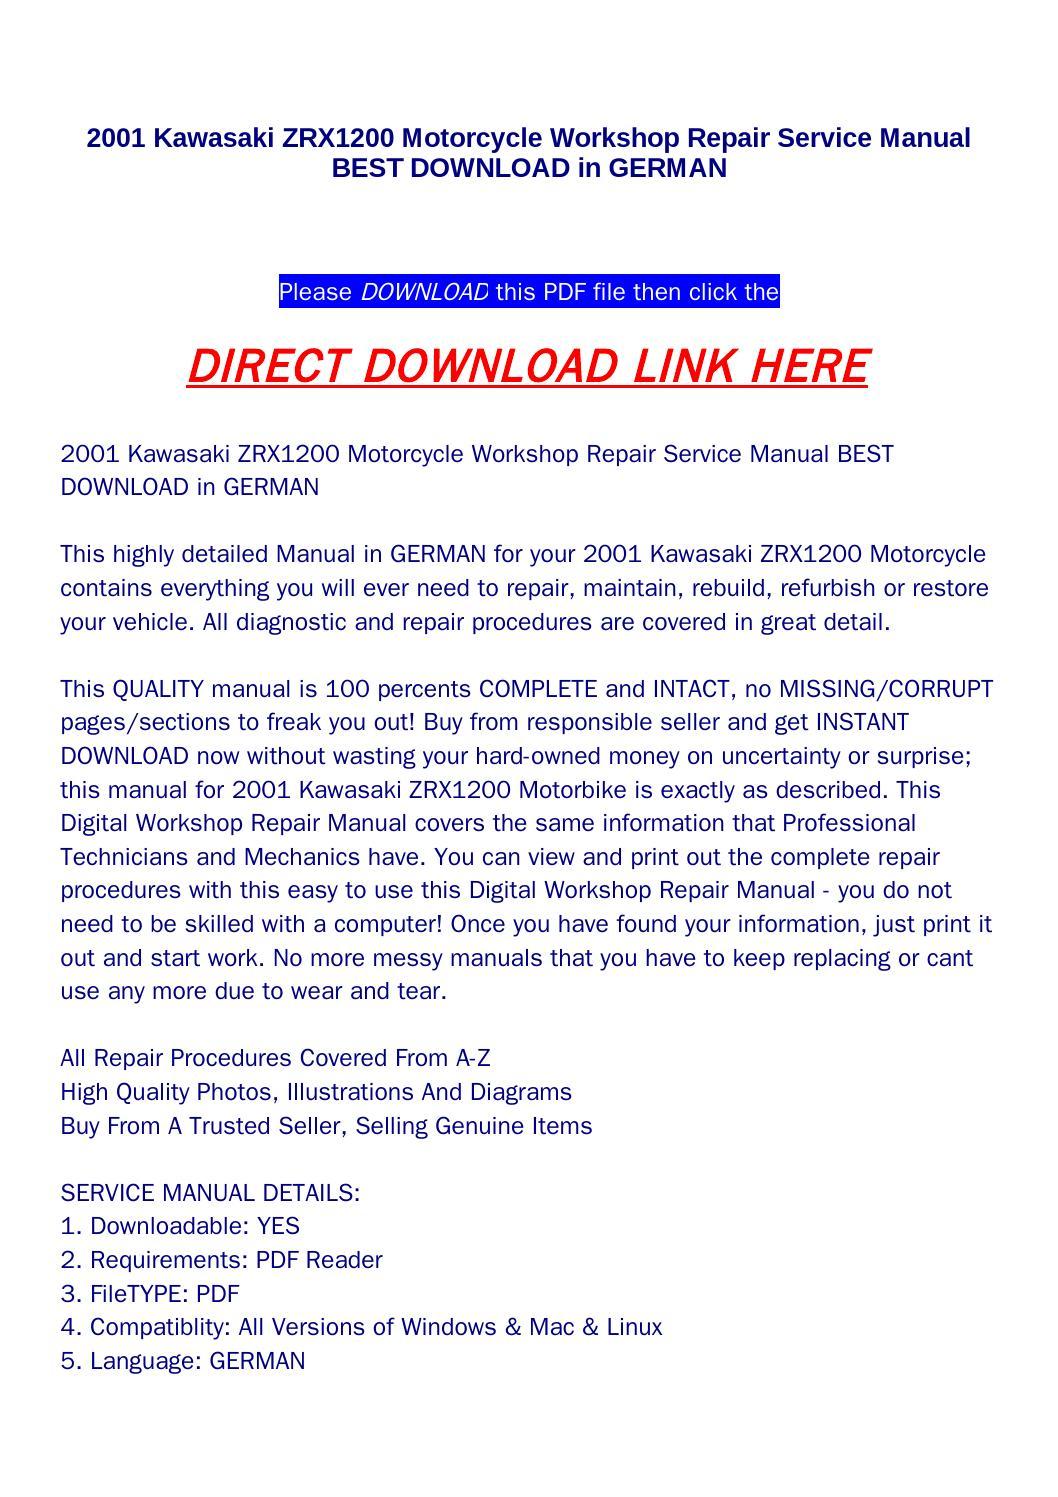 2001 kawasaki zrx1200 motorcycle workshop repair service manual best  download in german by jenny - issuu